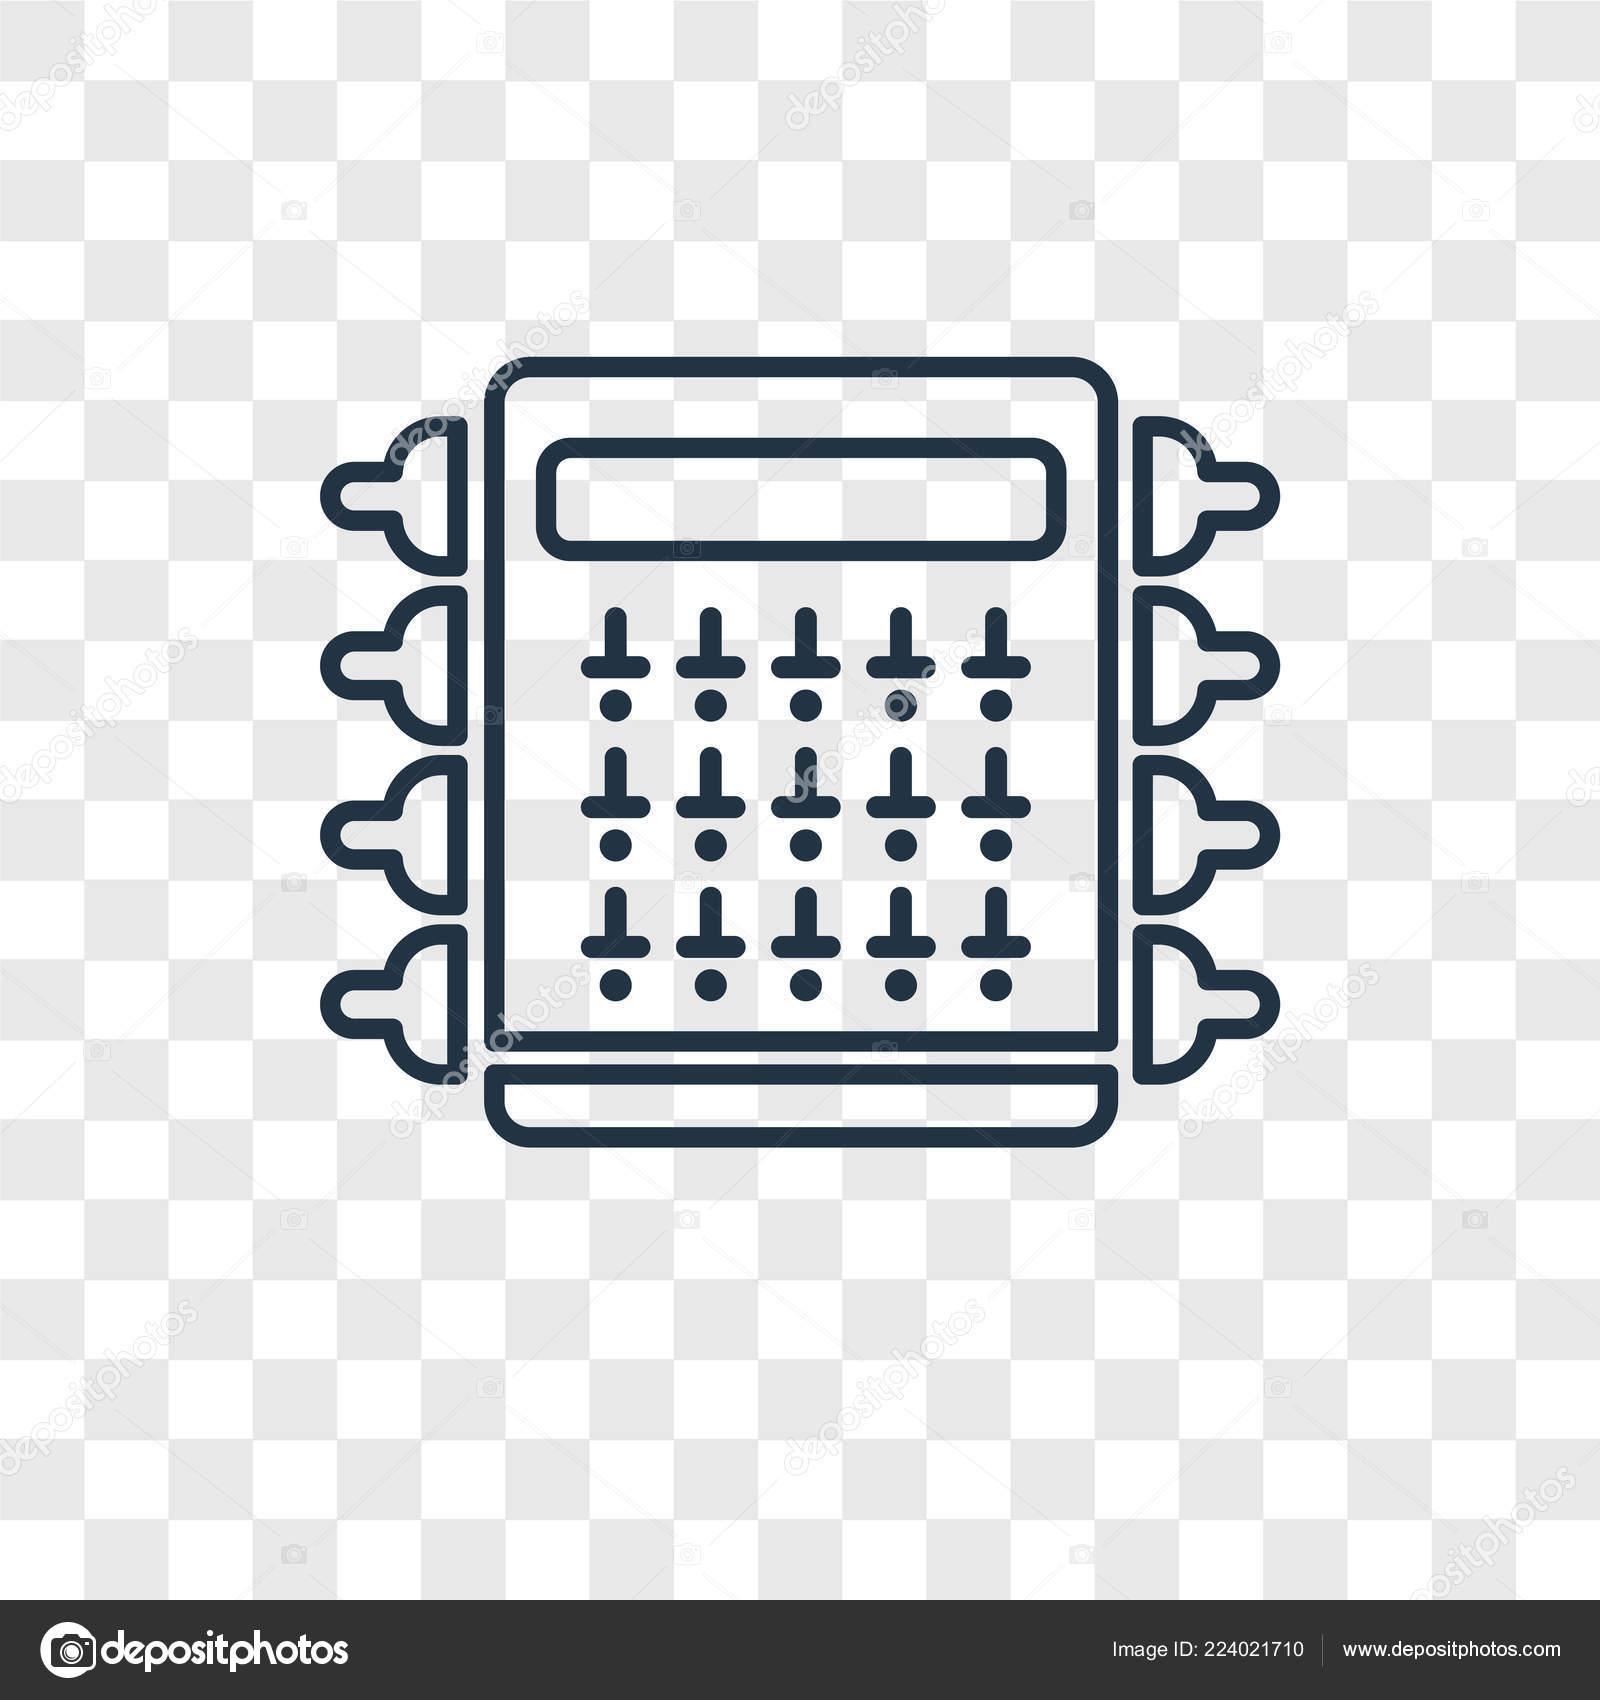 fuse box icon trendy design style fuse box icon isolated \u2014 stockfuse box icon in trendy design style fuse box icon isolated on transparent background fuse box vector icon simple and modern flat symbol for web site,